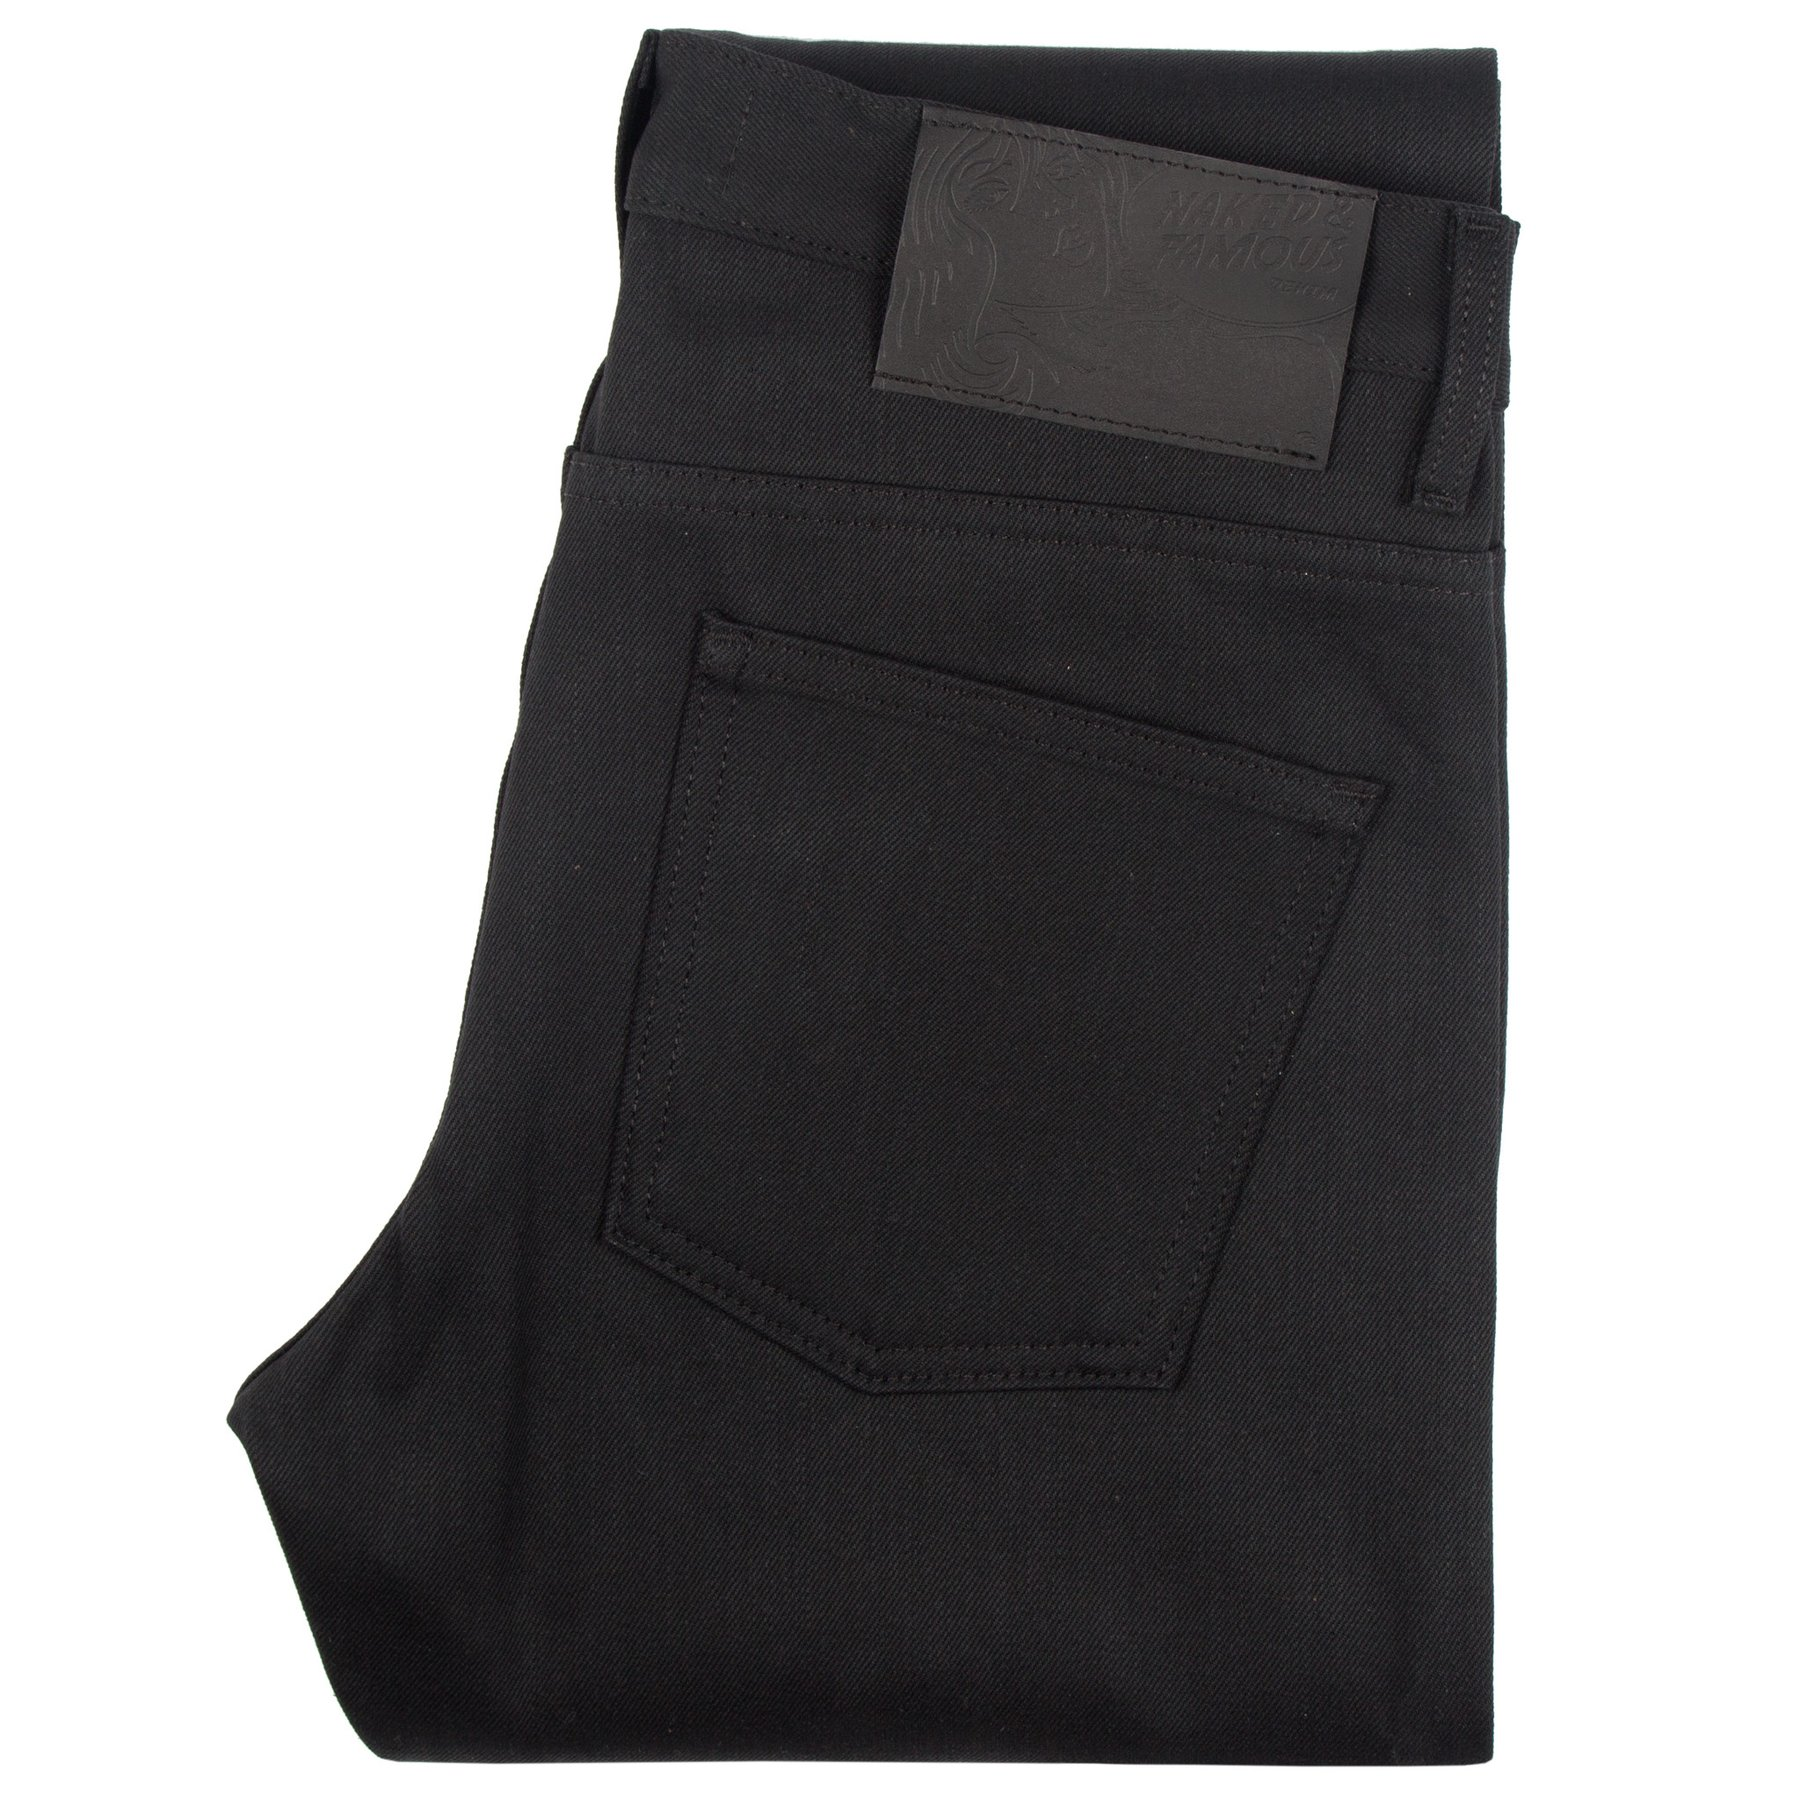 Solid Black Selvedge Jeans Folded